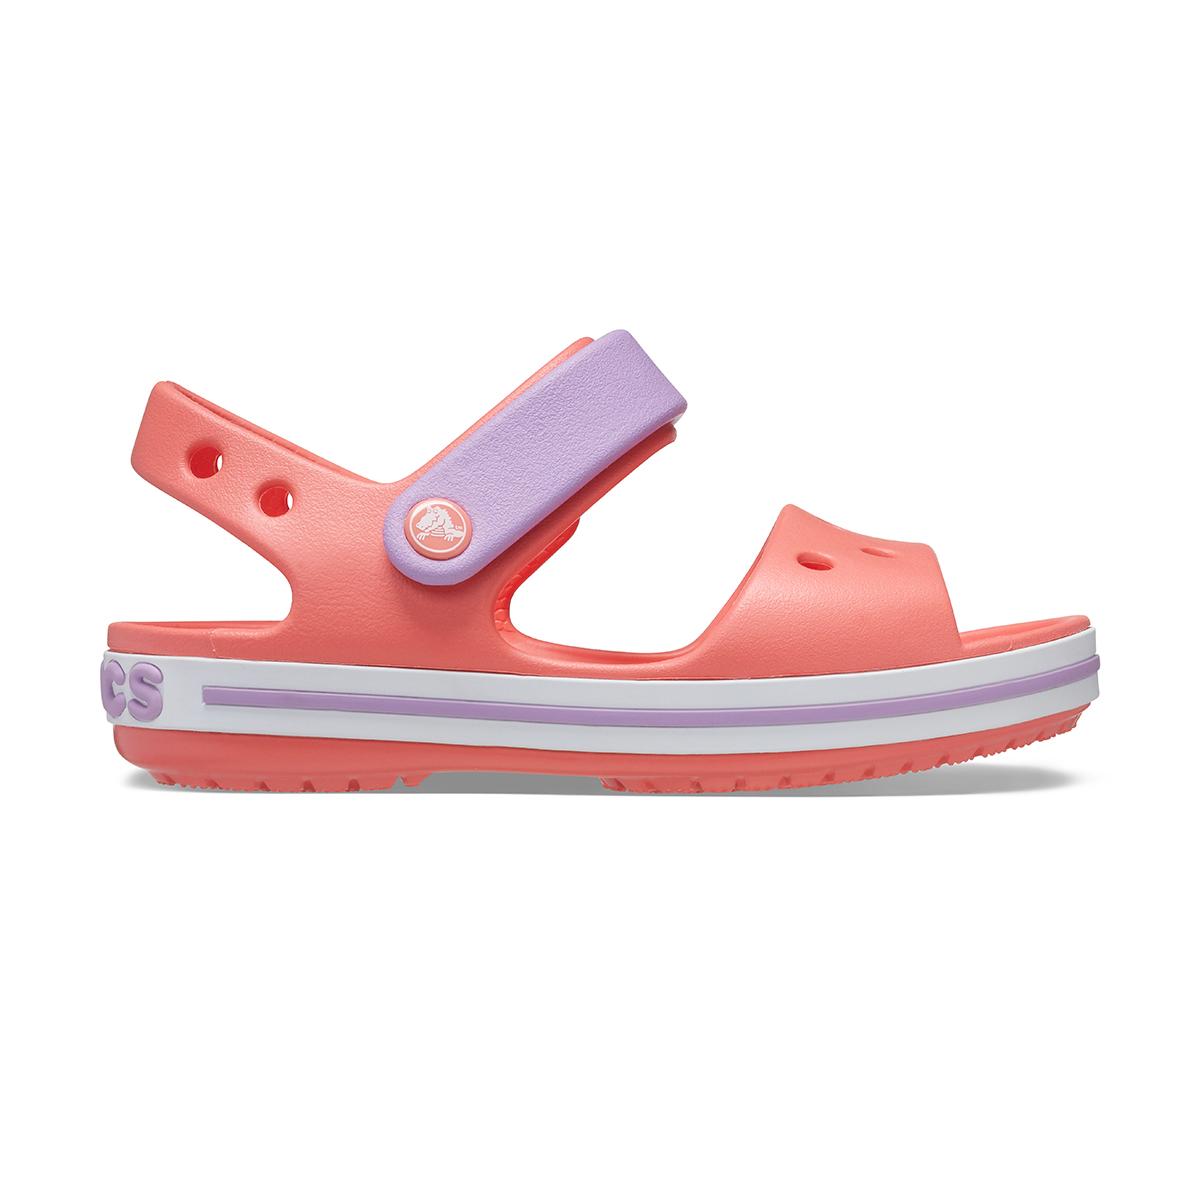 Crocband Sandal Kids - Fresco